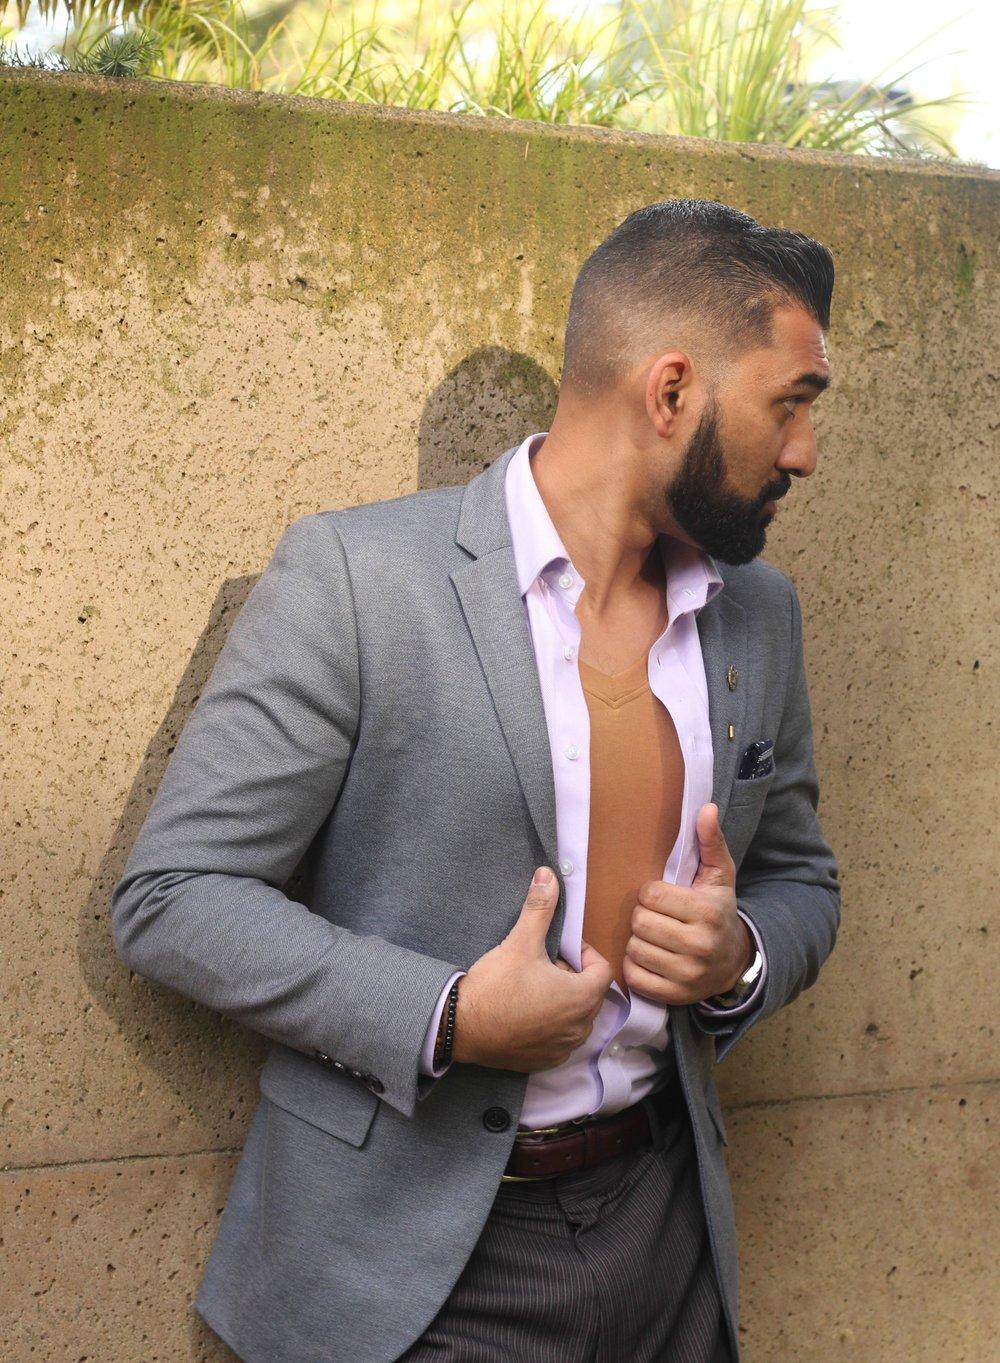 Mens Undershirt Guide Suited Soor Seattle Mens Fashion Blog